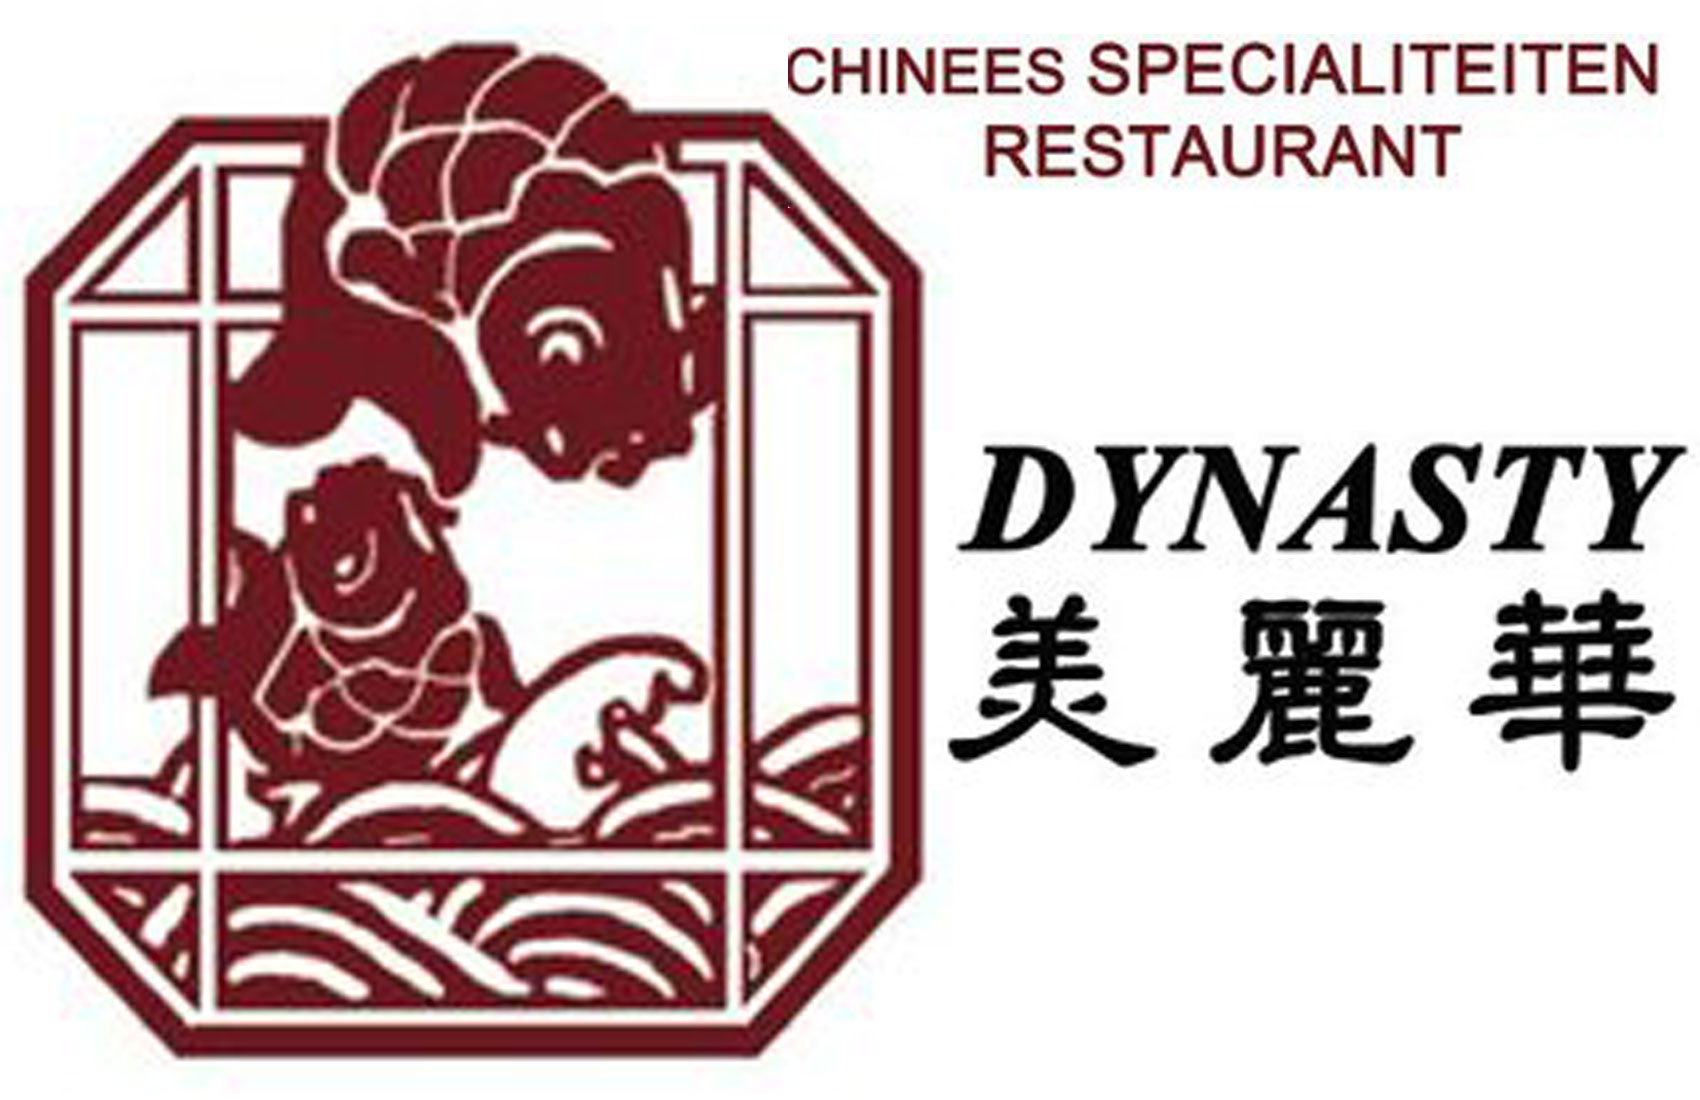 Dynasty Chinees Restaurant